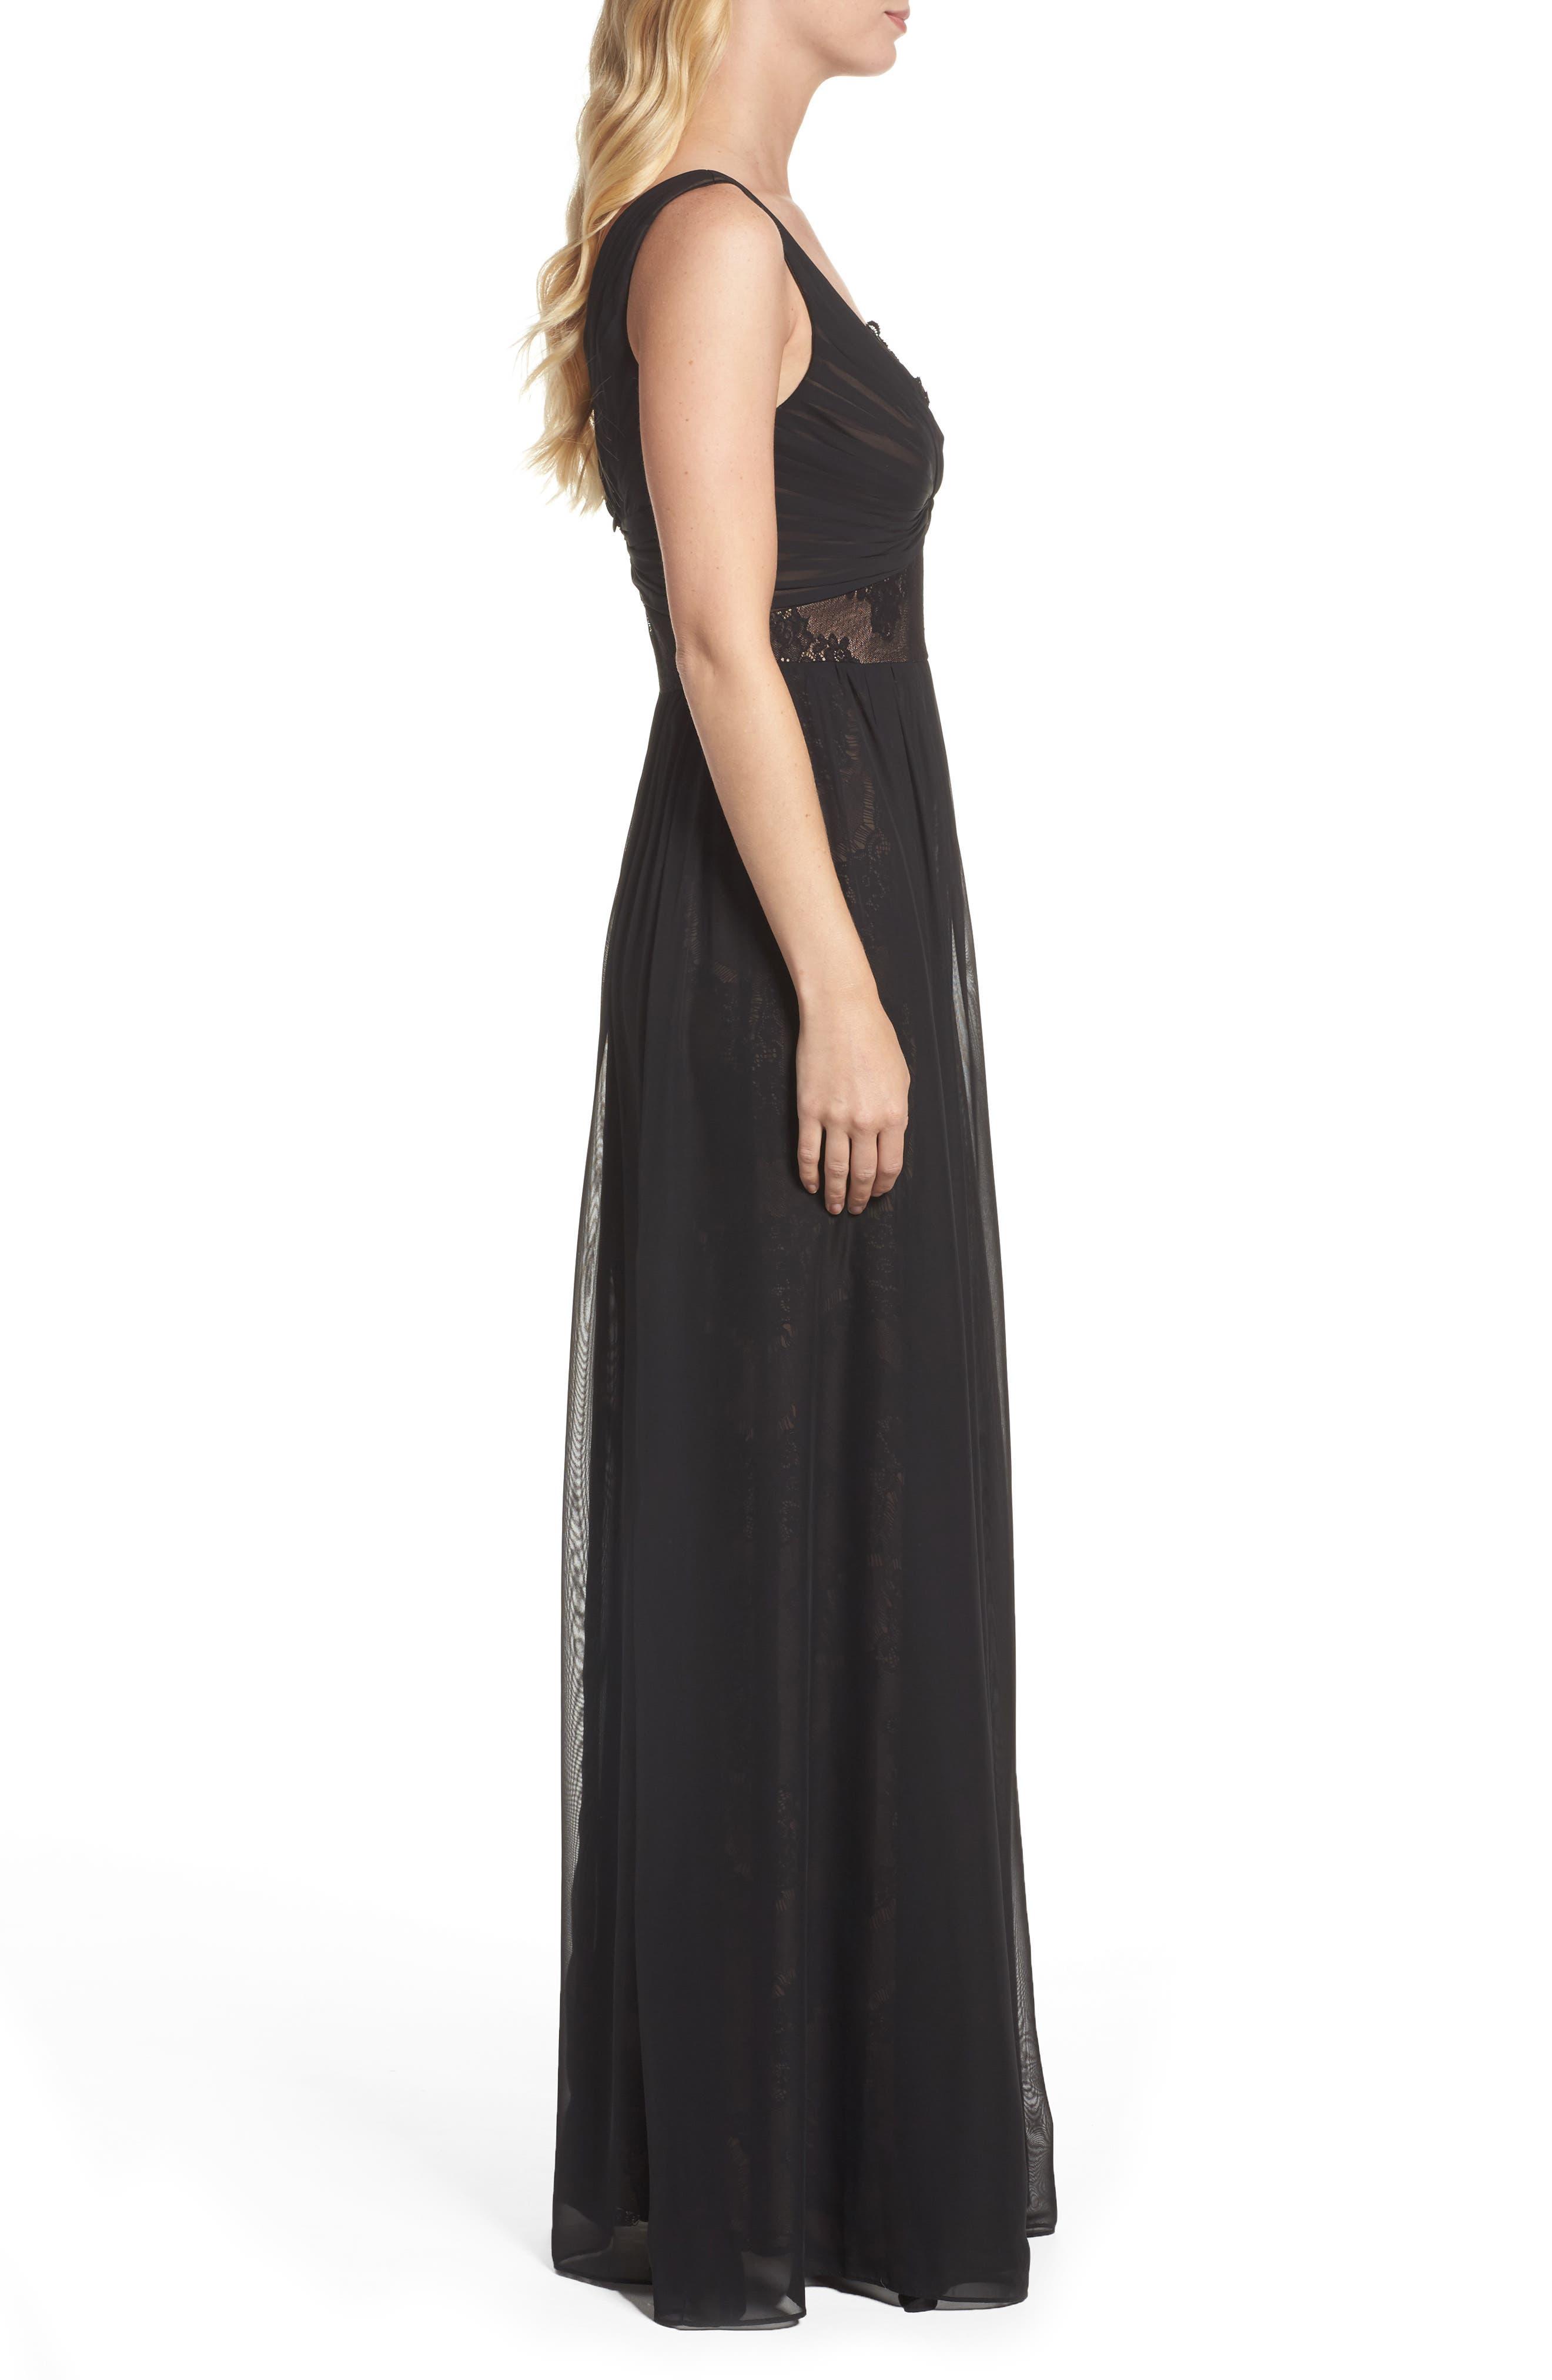 Lace Detail Gown,                             Alternate thumbnail 3, color,                             Black Nude